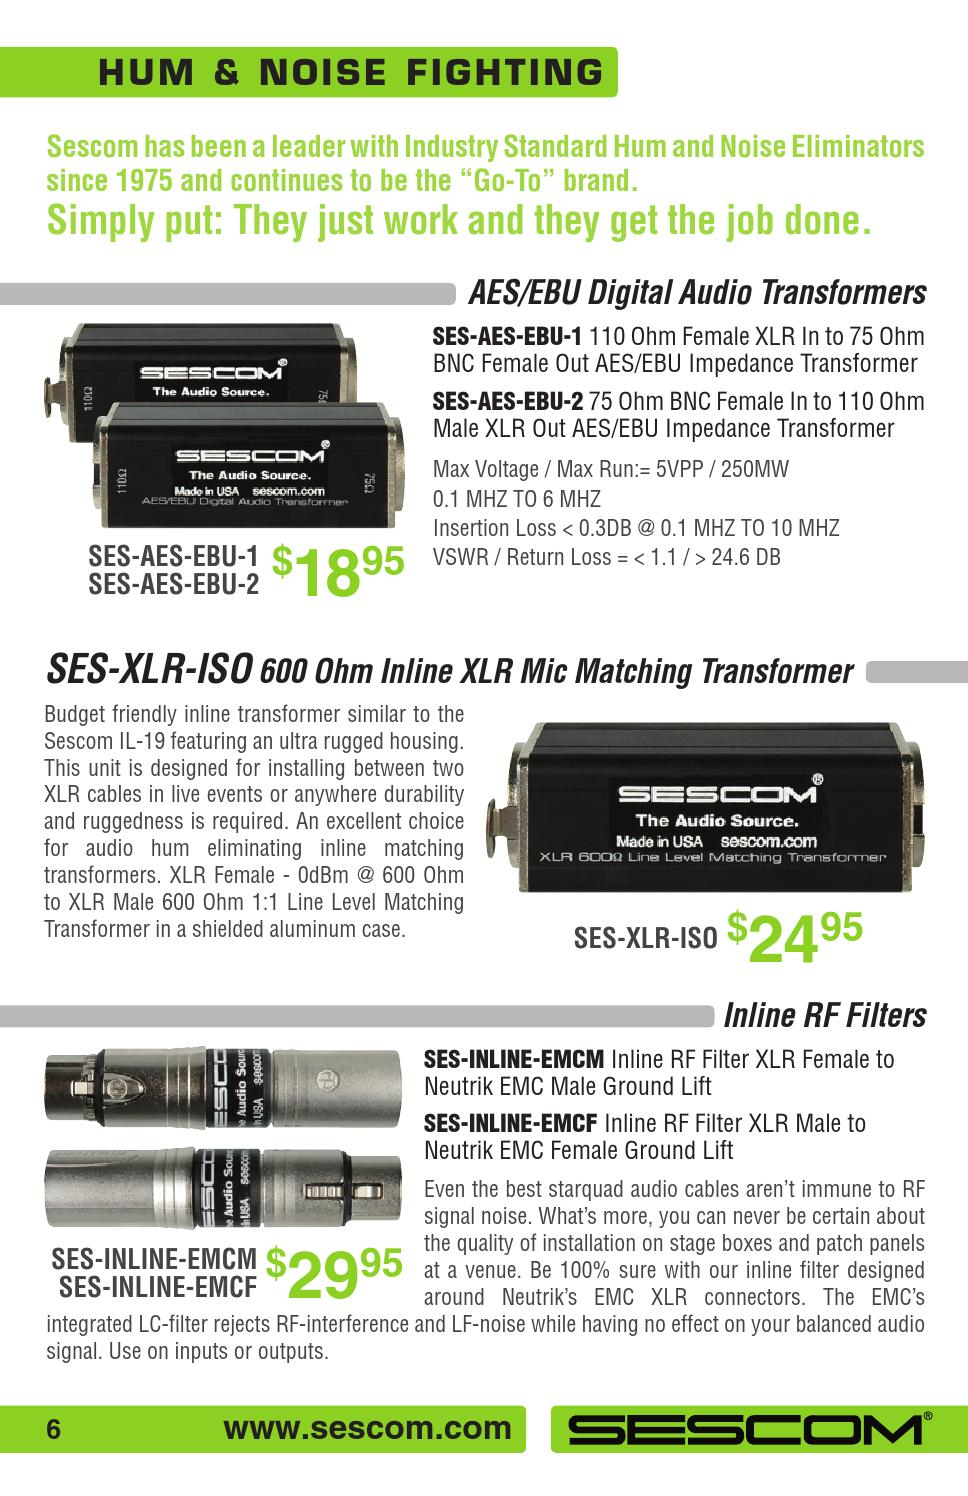 Sescom SES-INLINE-EMCF Inline RF Filter XLR Male to Neutrik EMC Female Ground Lift